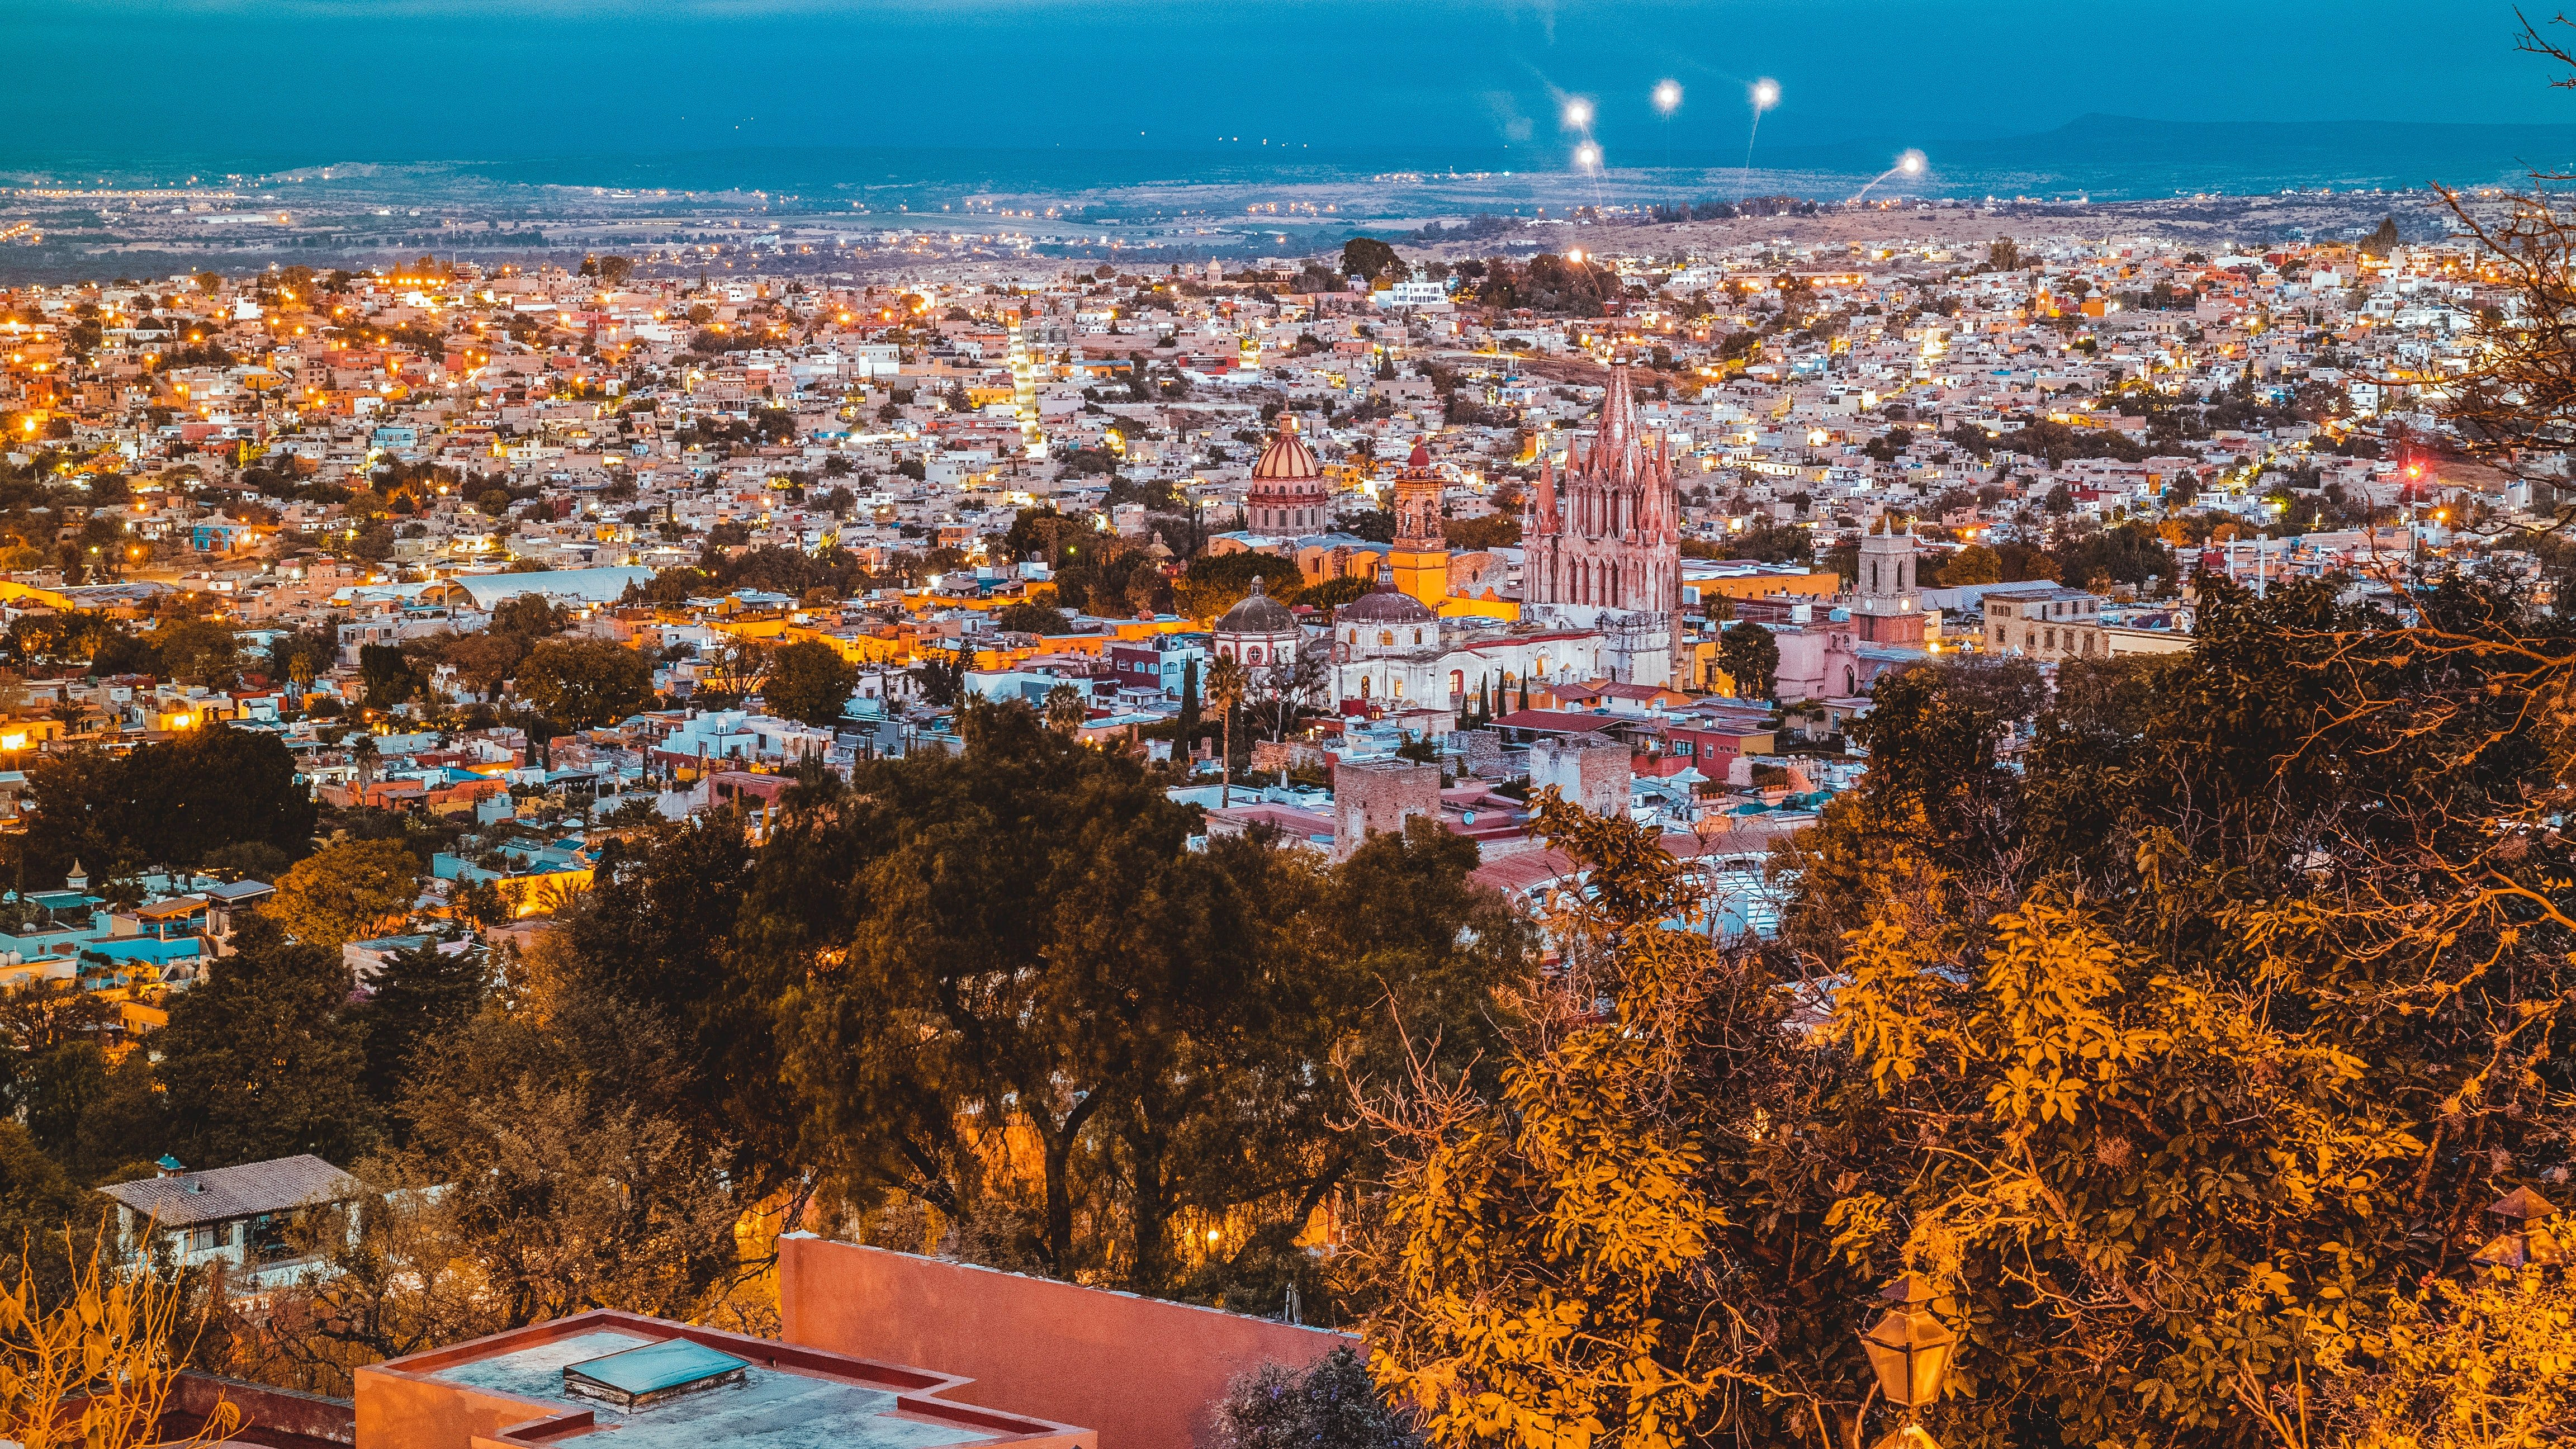 Mexico Photo by Daniels Joffe on Unsplash